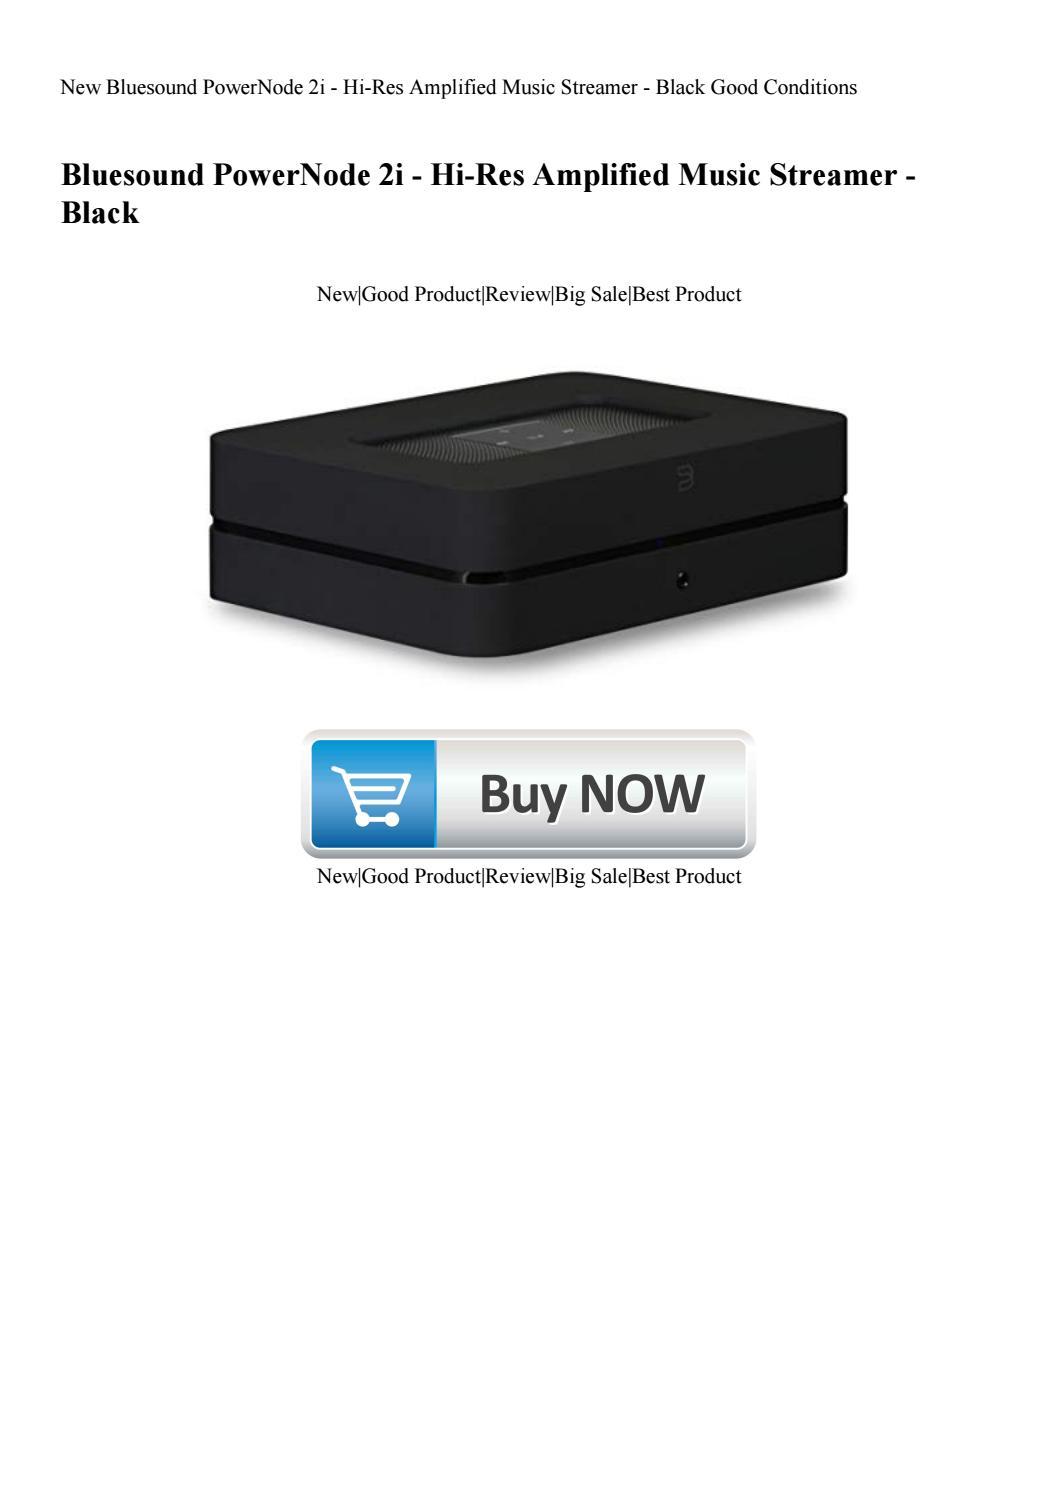 Black Hi-Res Amplified Music Streamer Bluesound PowerNode 2i